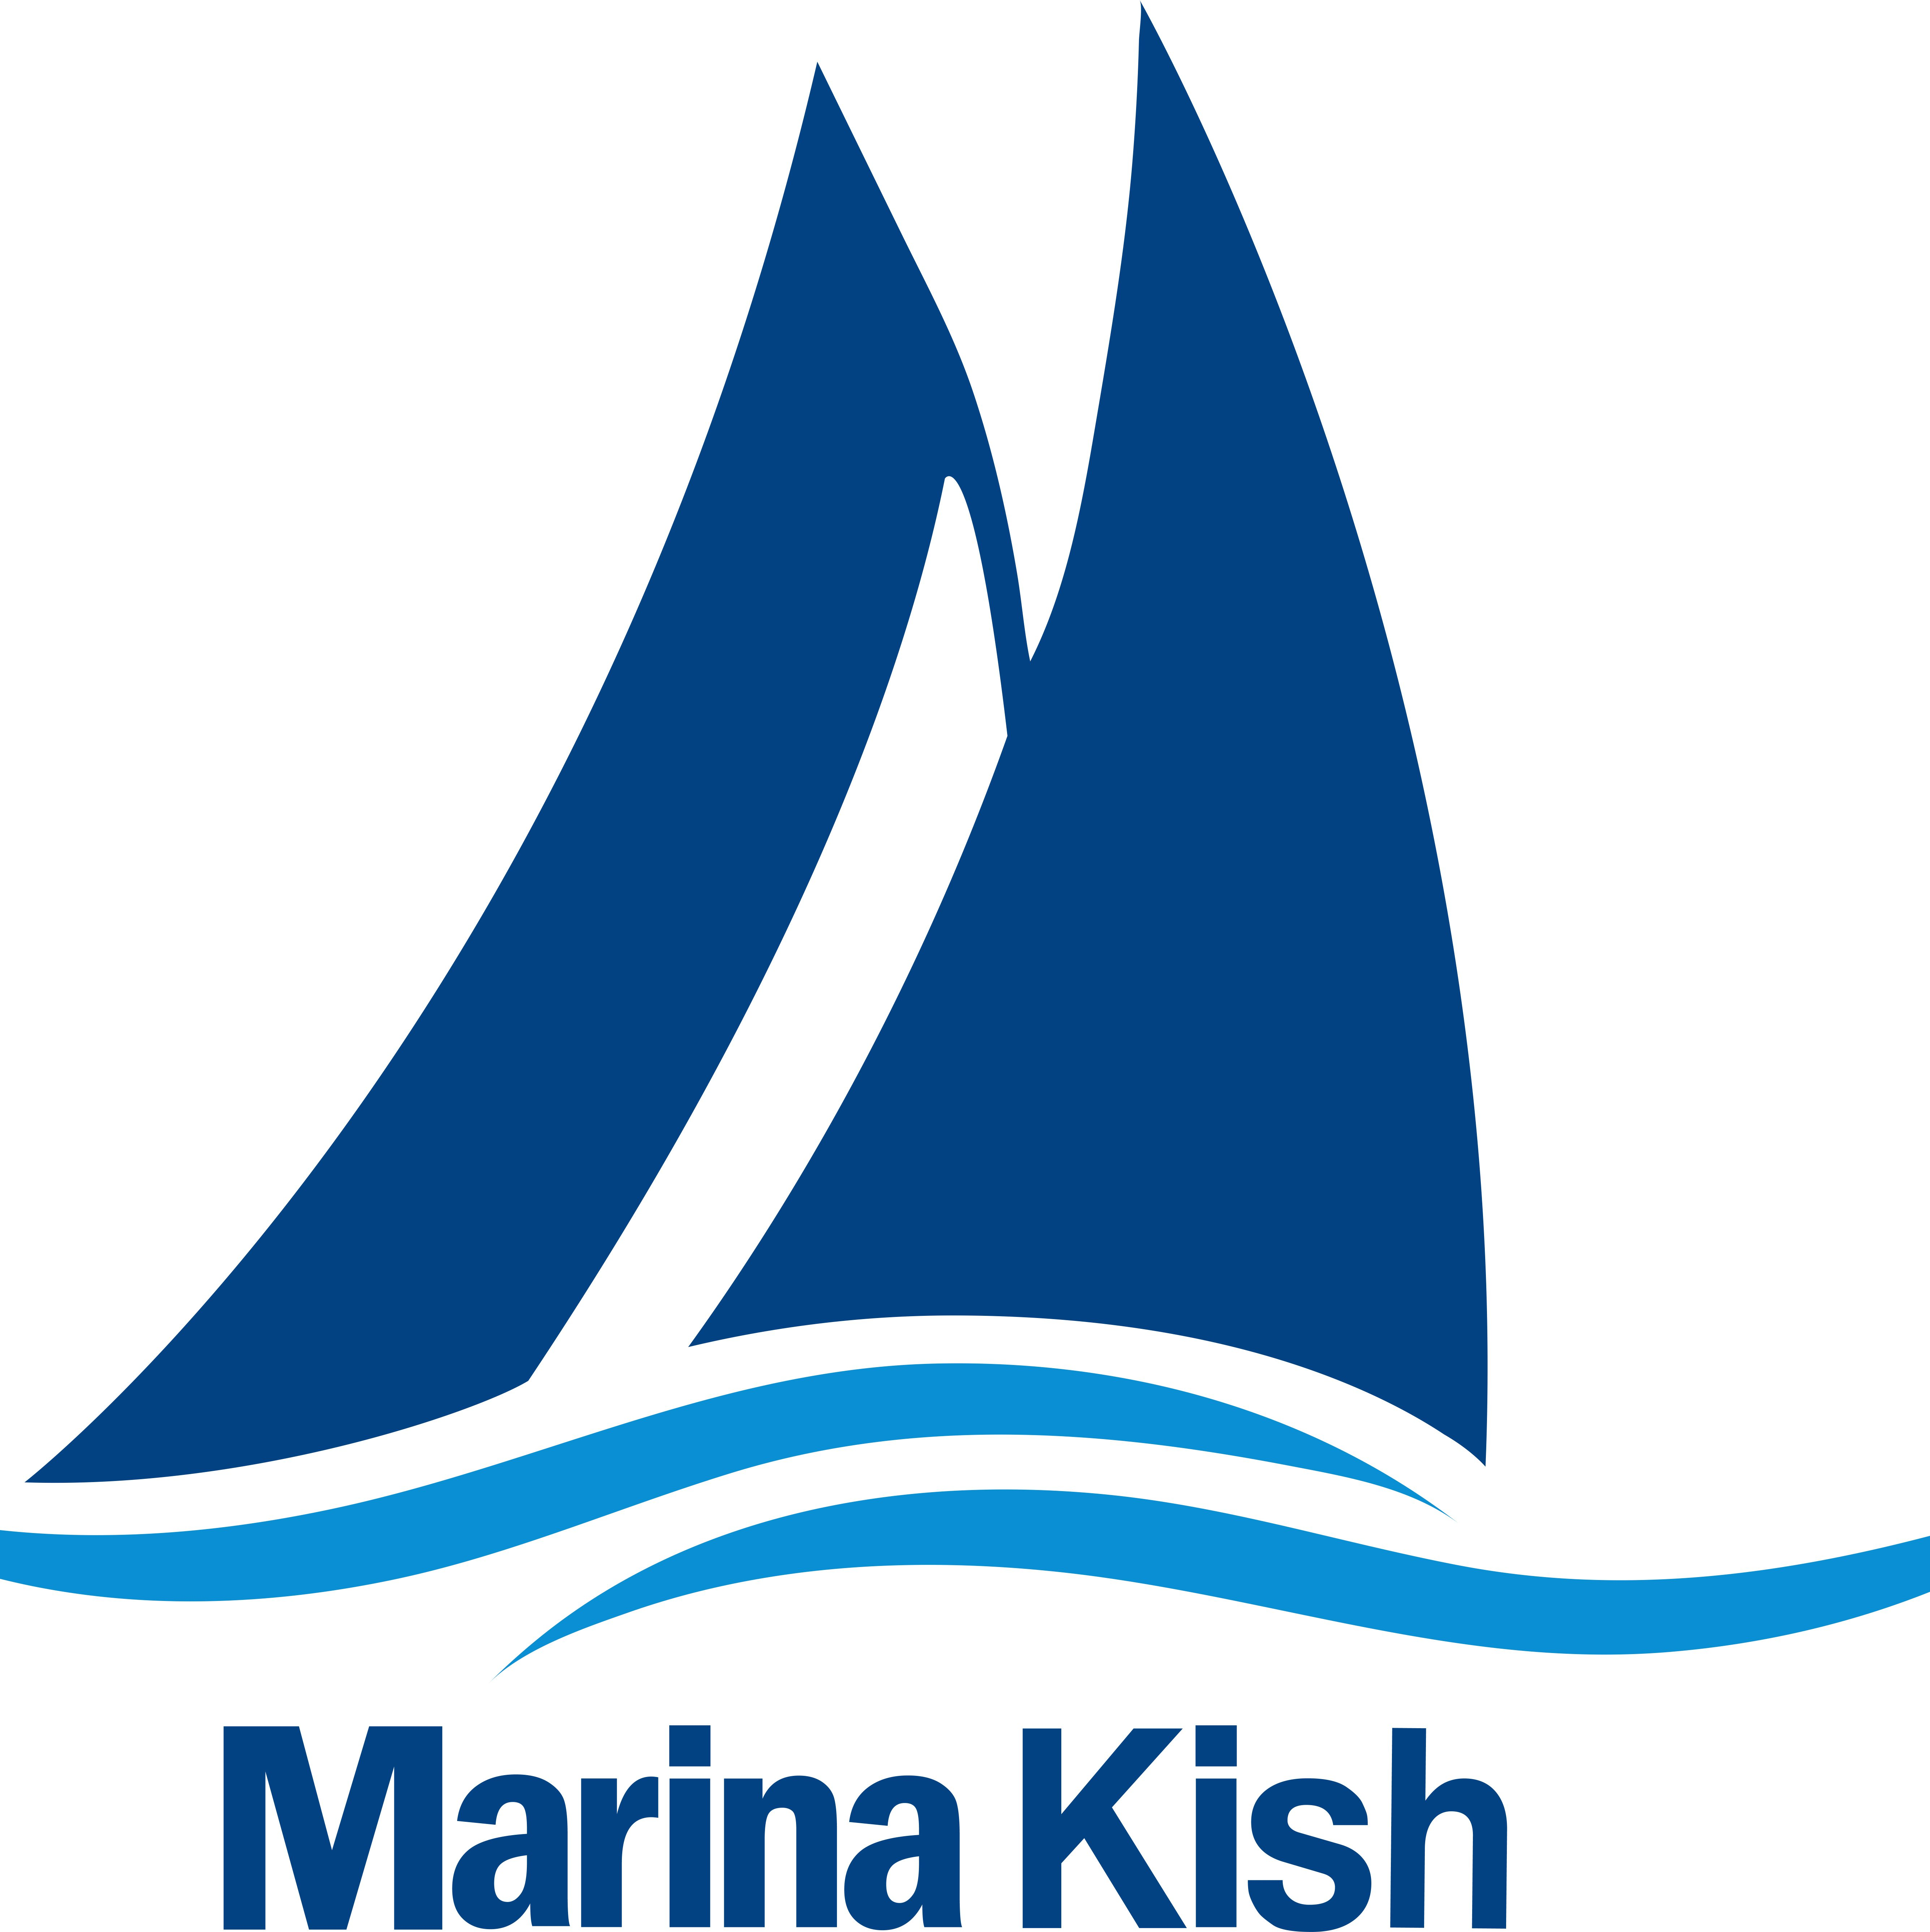 ماریناکیش، نخستین مارینای کشور |   کایاک پارویی